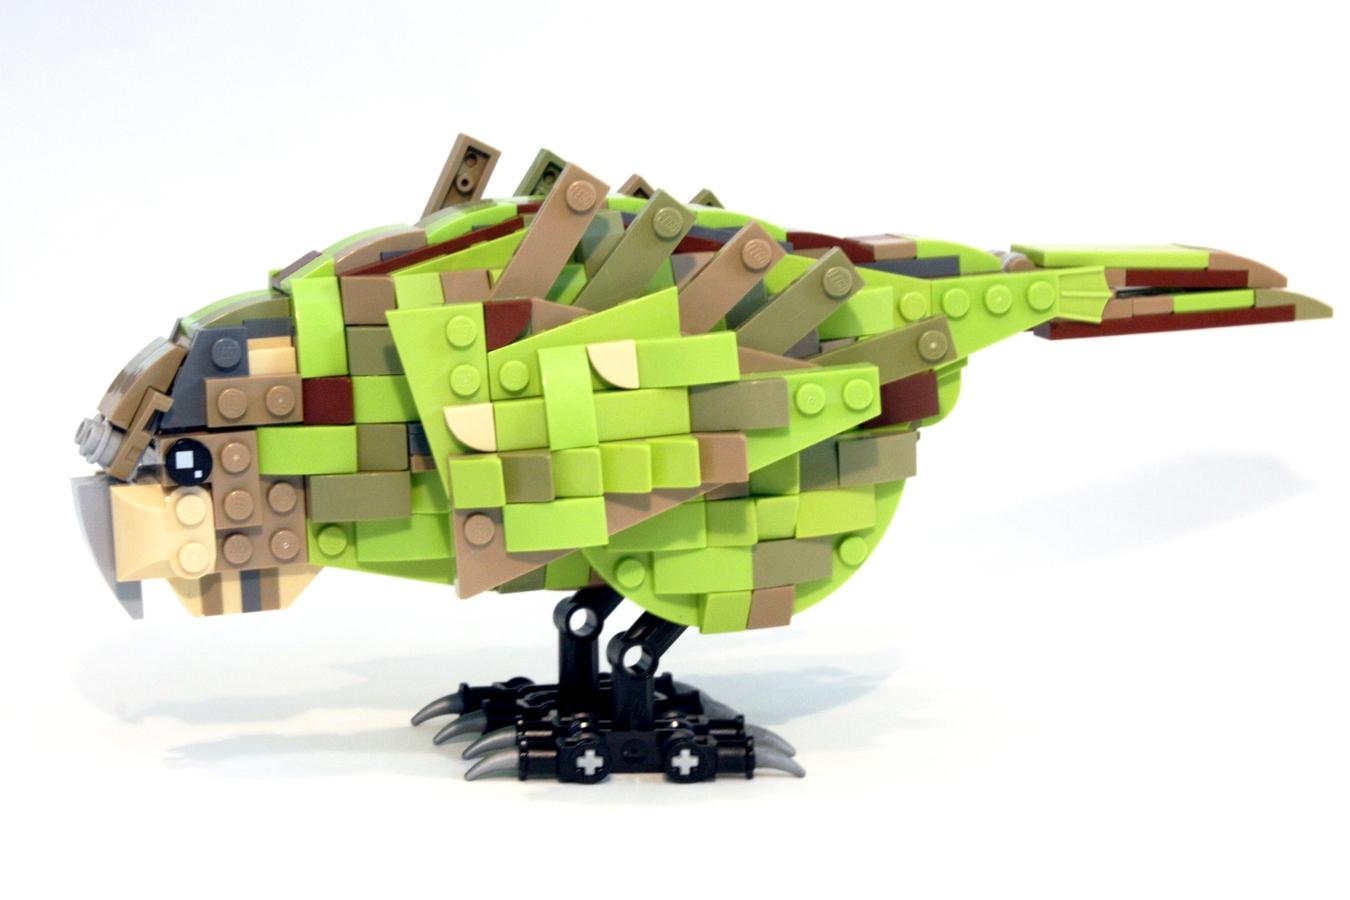 lego-ideas-kakapo-seite-flancrestenterprises zusammengebaut.com